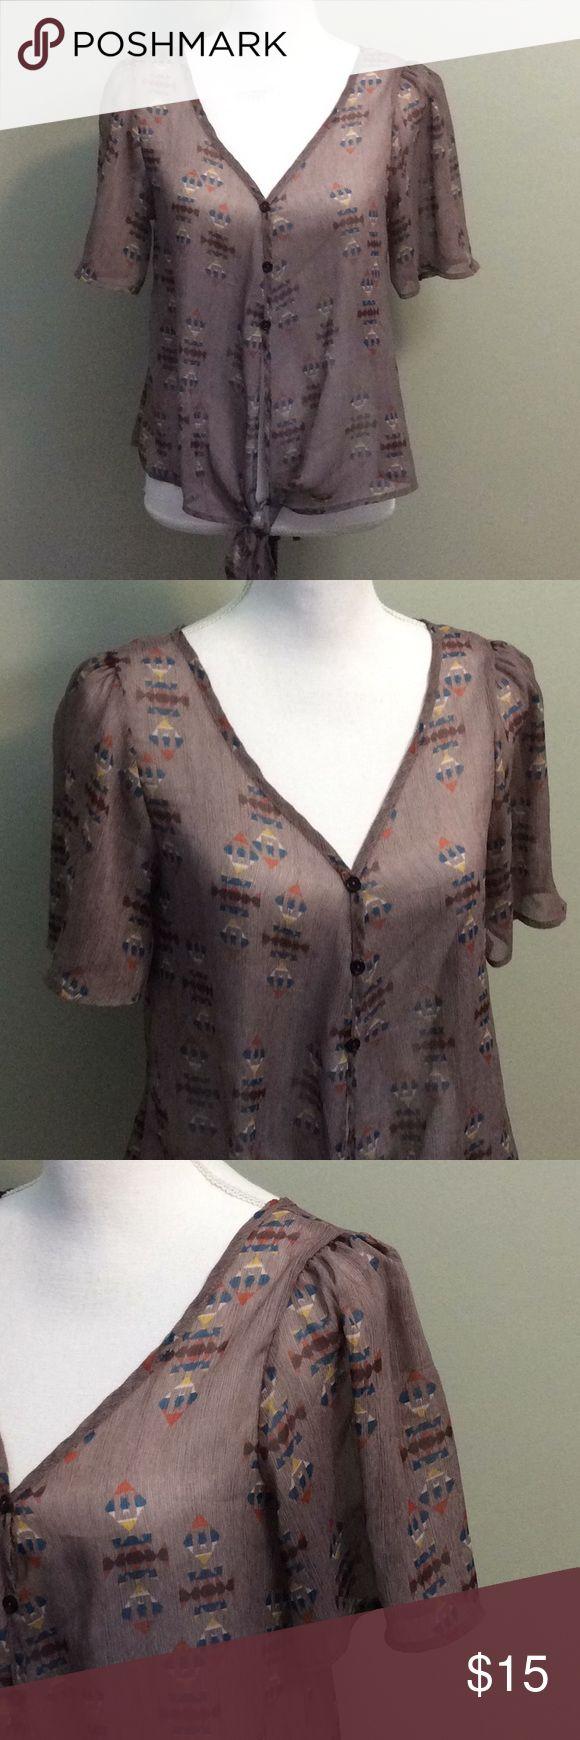 "Kirra Tie Front Aztec Print Blouse Kirra Womens Sheer Short Sleeve Tie Front Southwestern Blouse Size Small Length-22"" Sleeve-4"" Chest-14"" Kirra Tops Blouses"